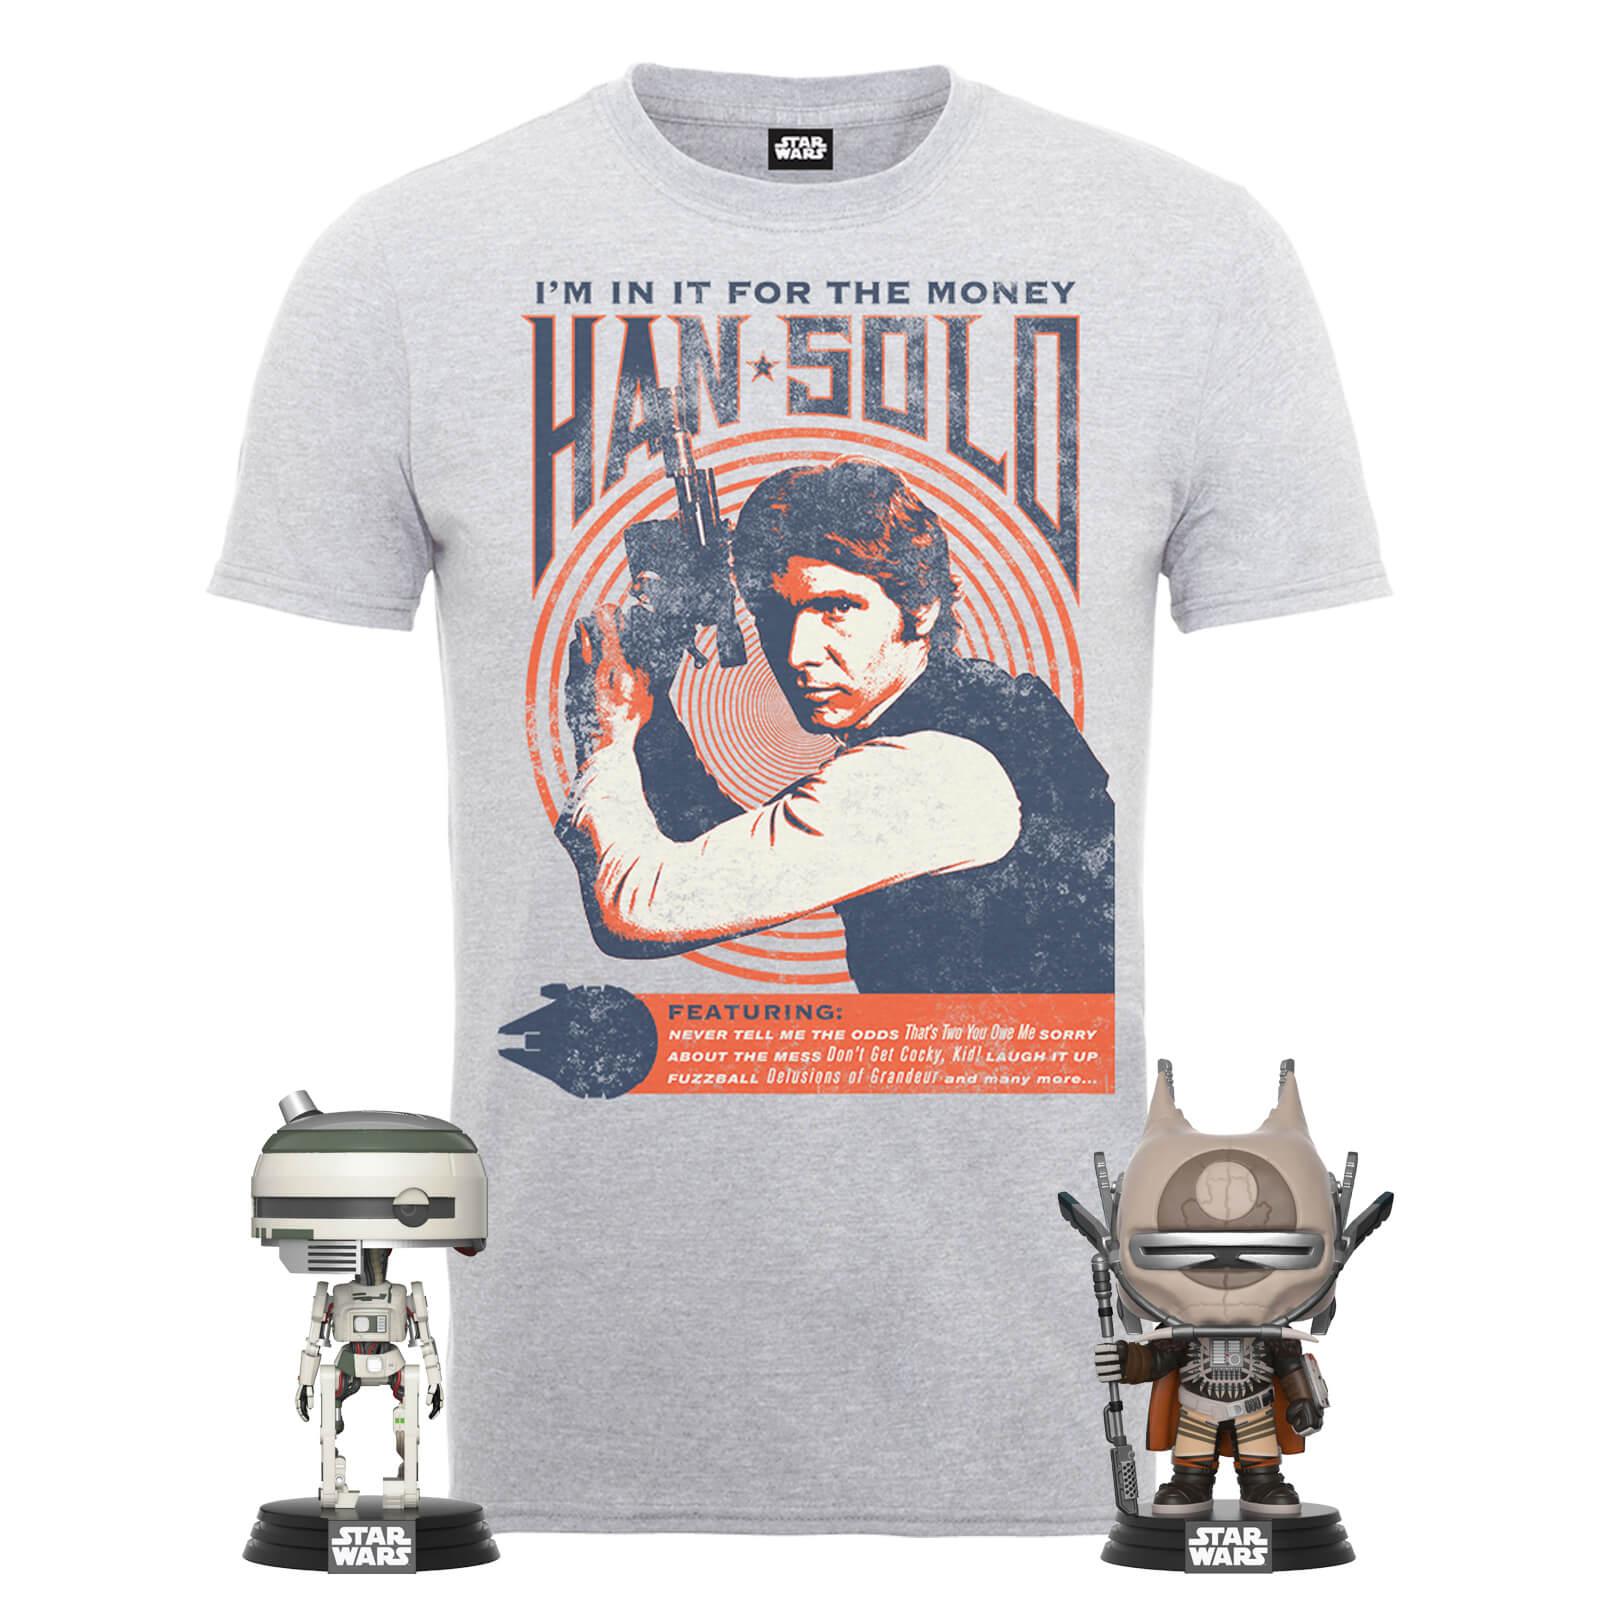 Star Wars: Han Solo T-Shirt + 2 Funko Pop Figuren für 18,48€ inkl. Versand (Zavvi.de)